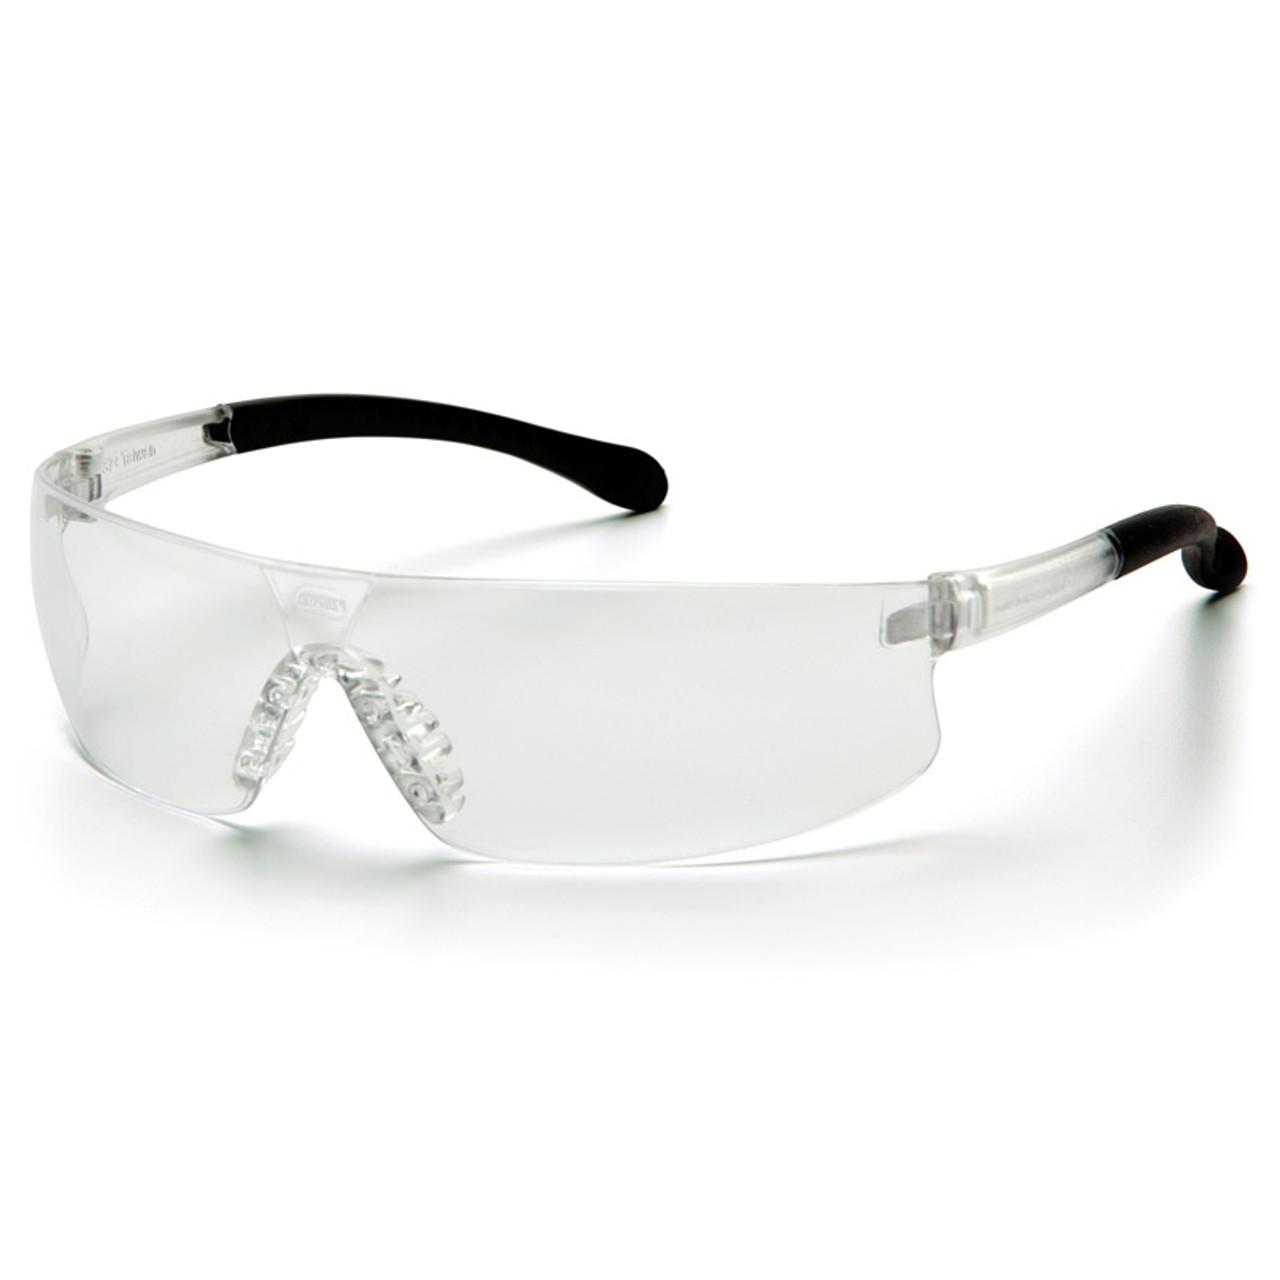 bcb6758e580 Pyramex Safety Glasses Provoq Clear - Box Of 12 SB5760SFT